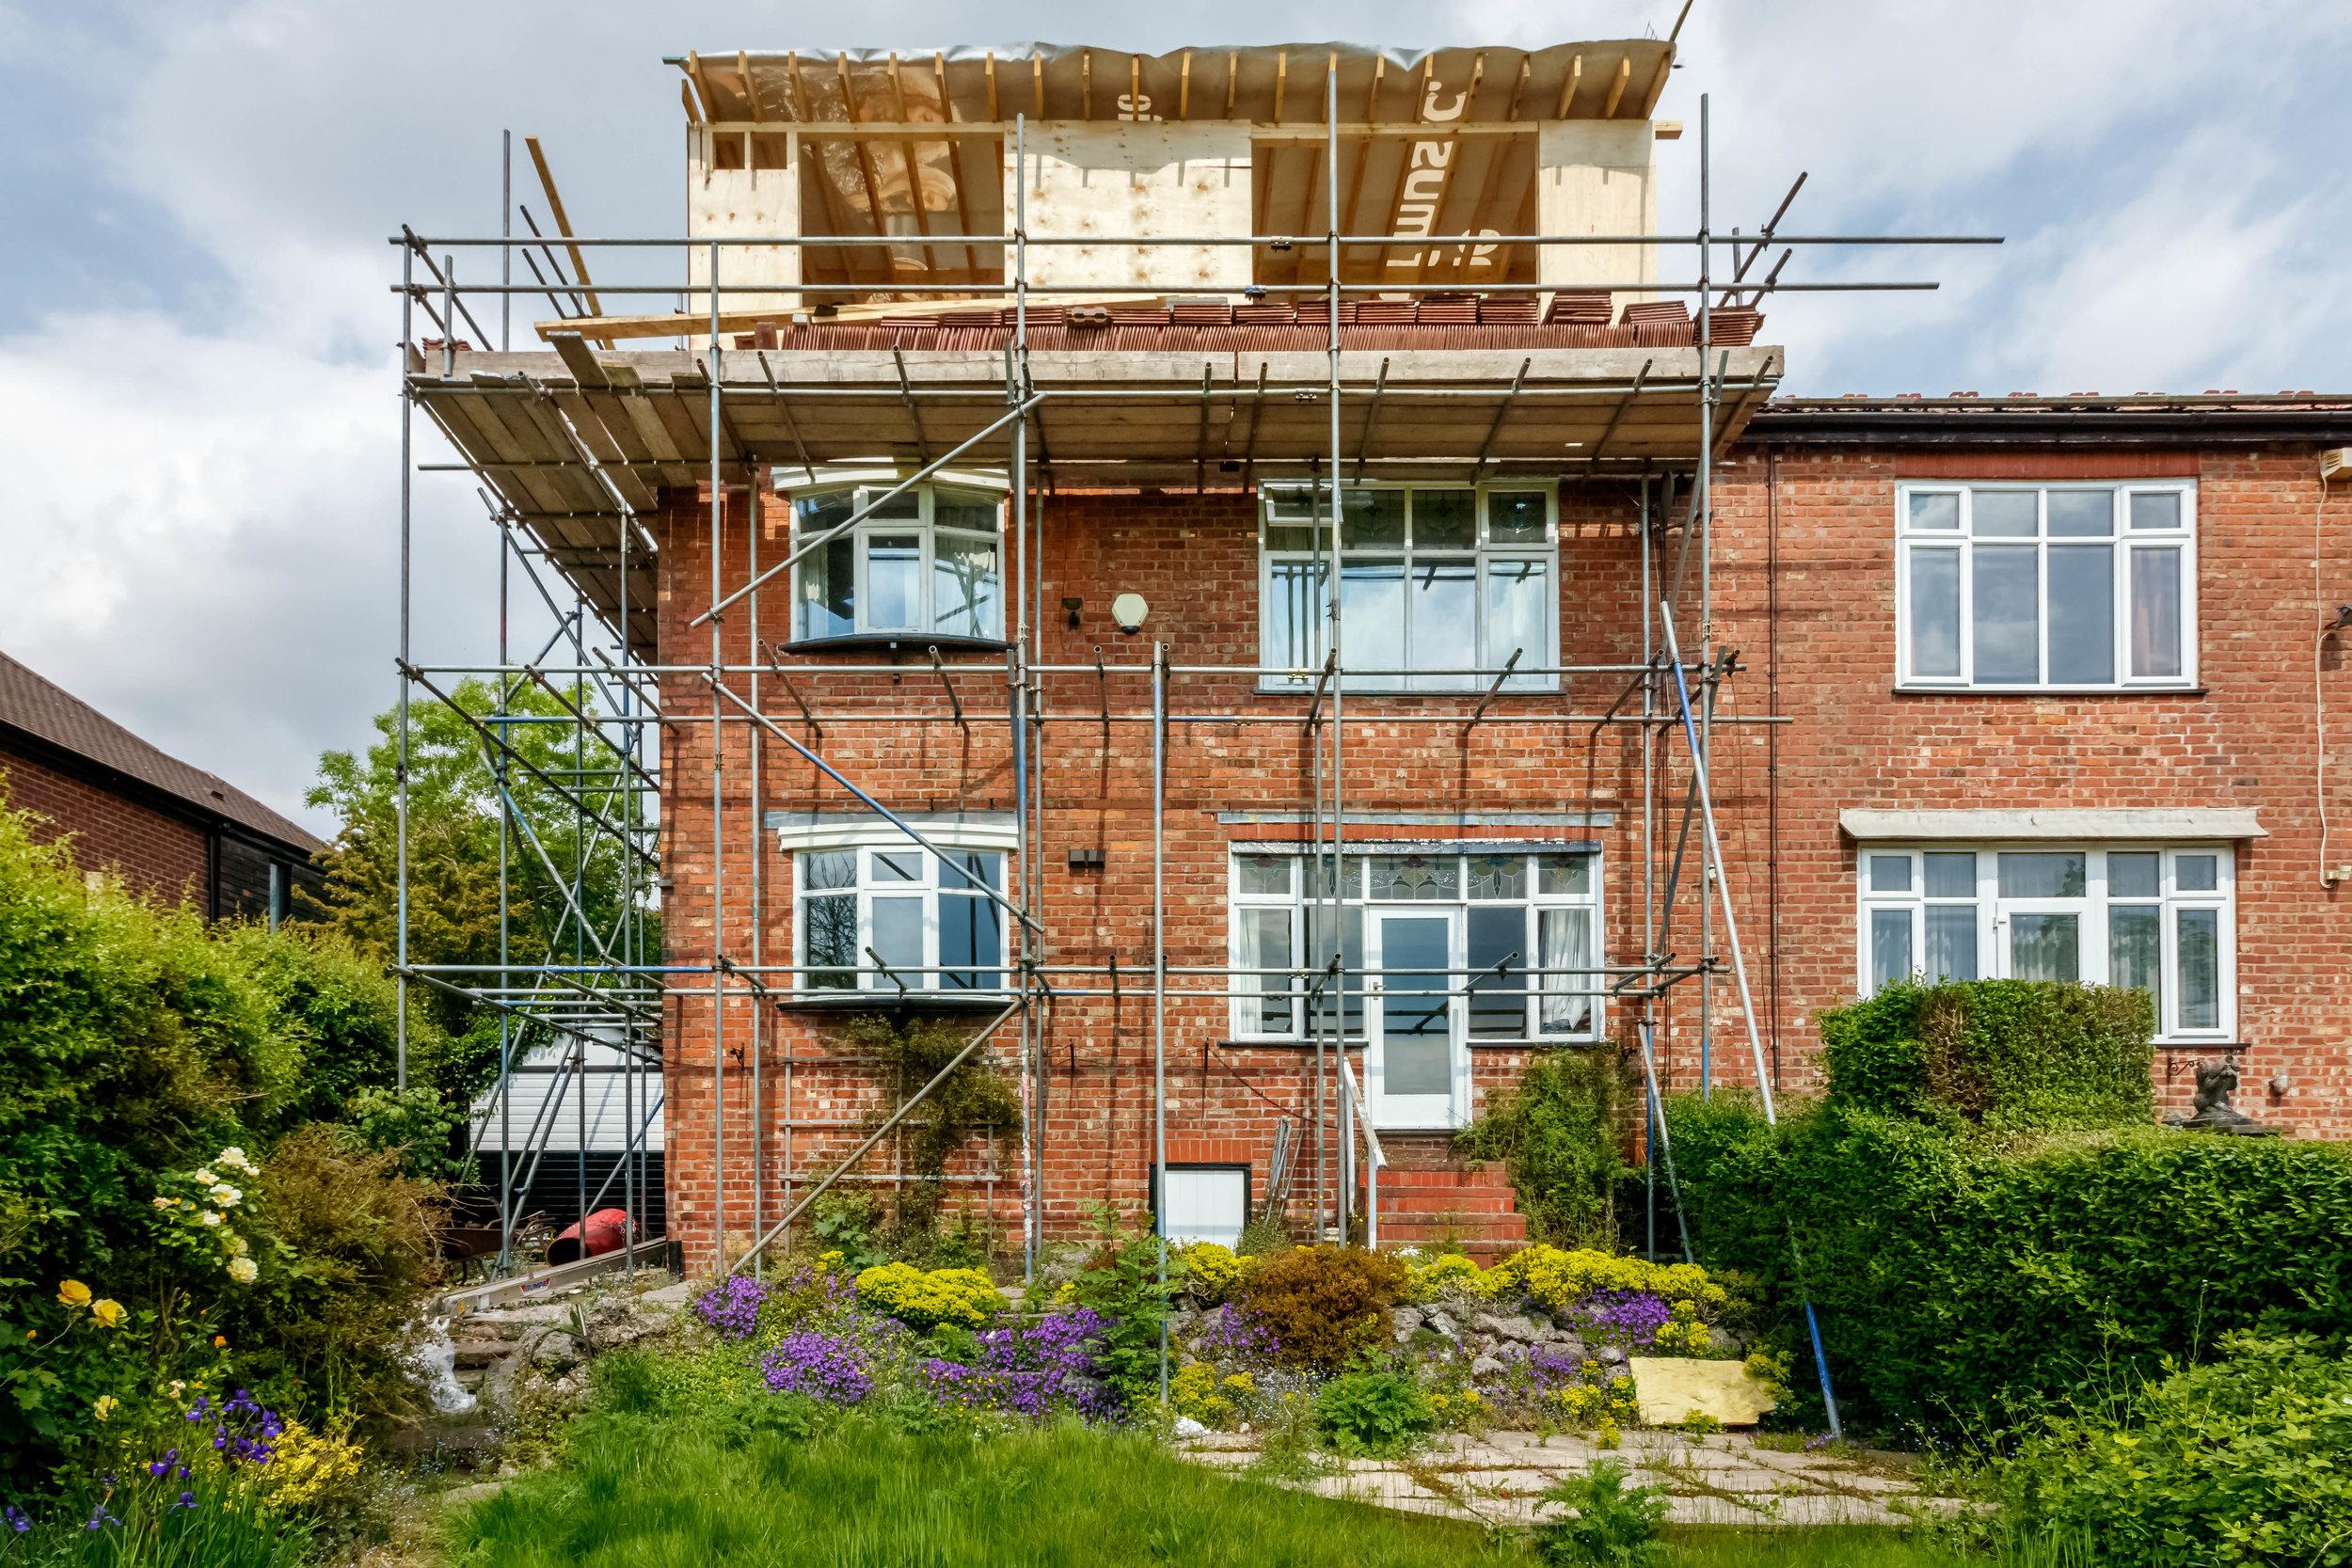 PropertyPhotographs-05065.jpg